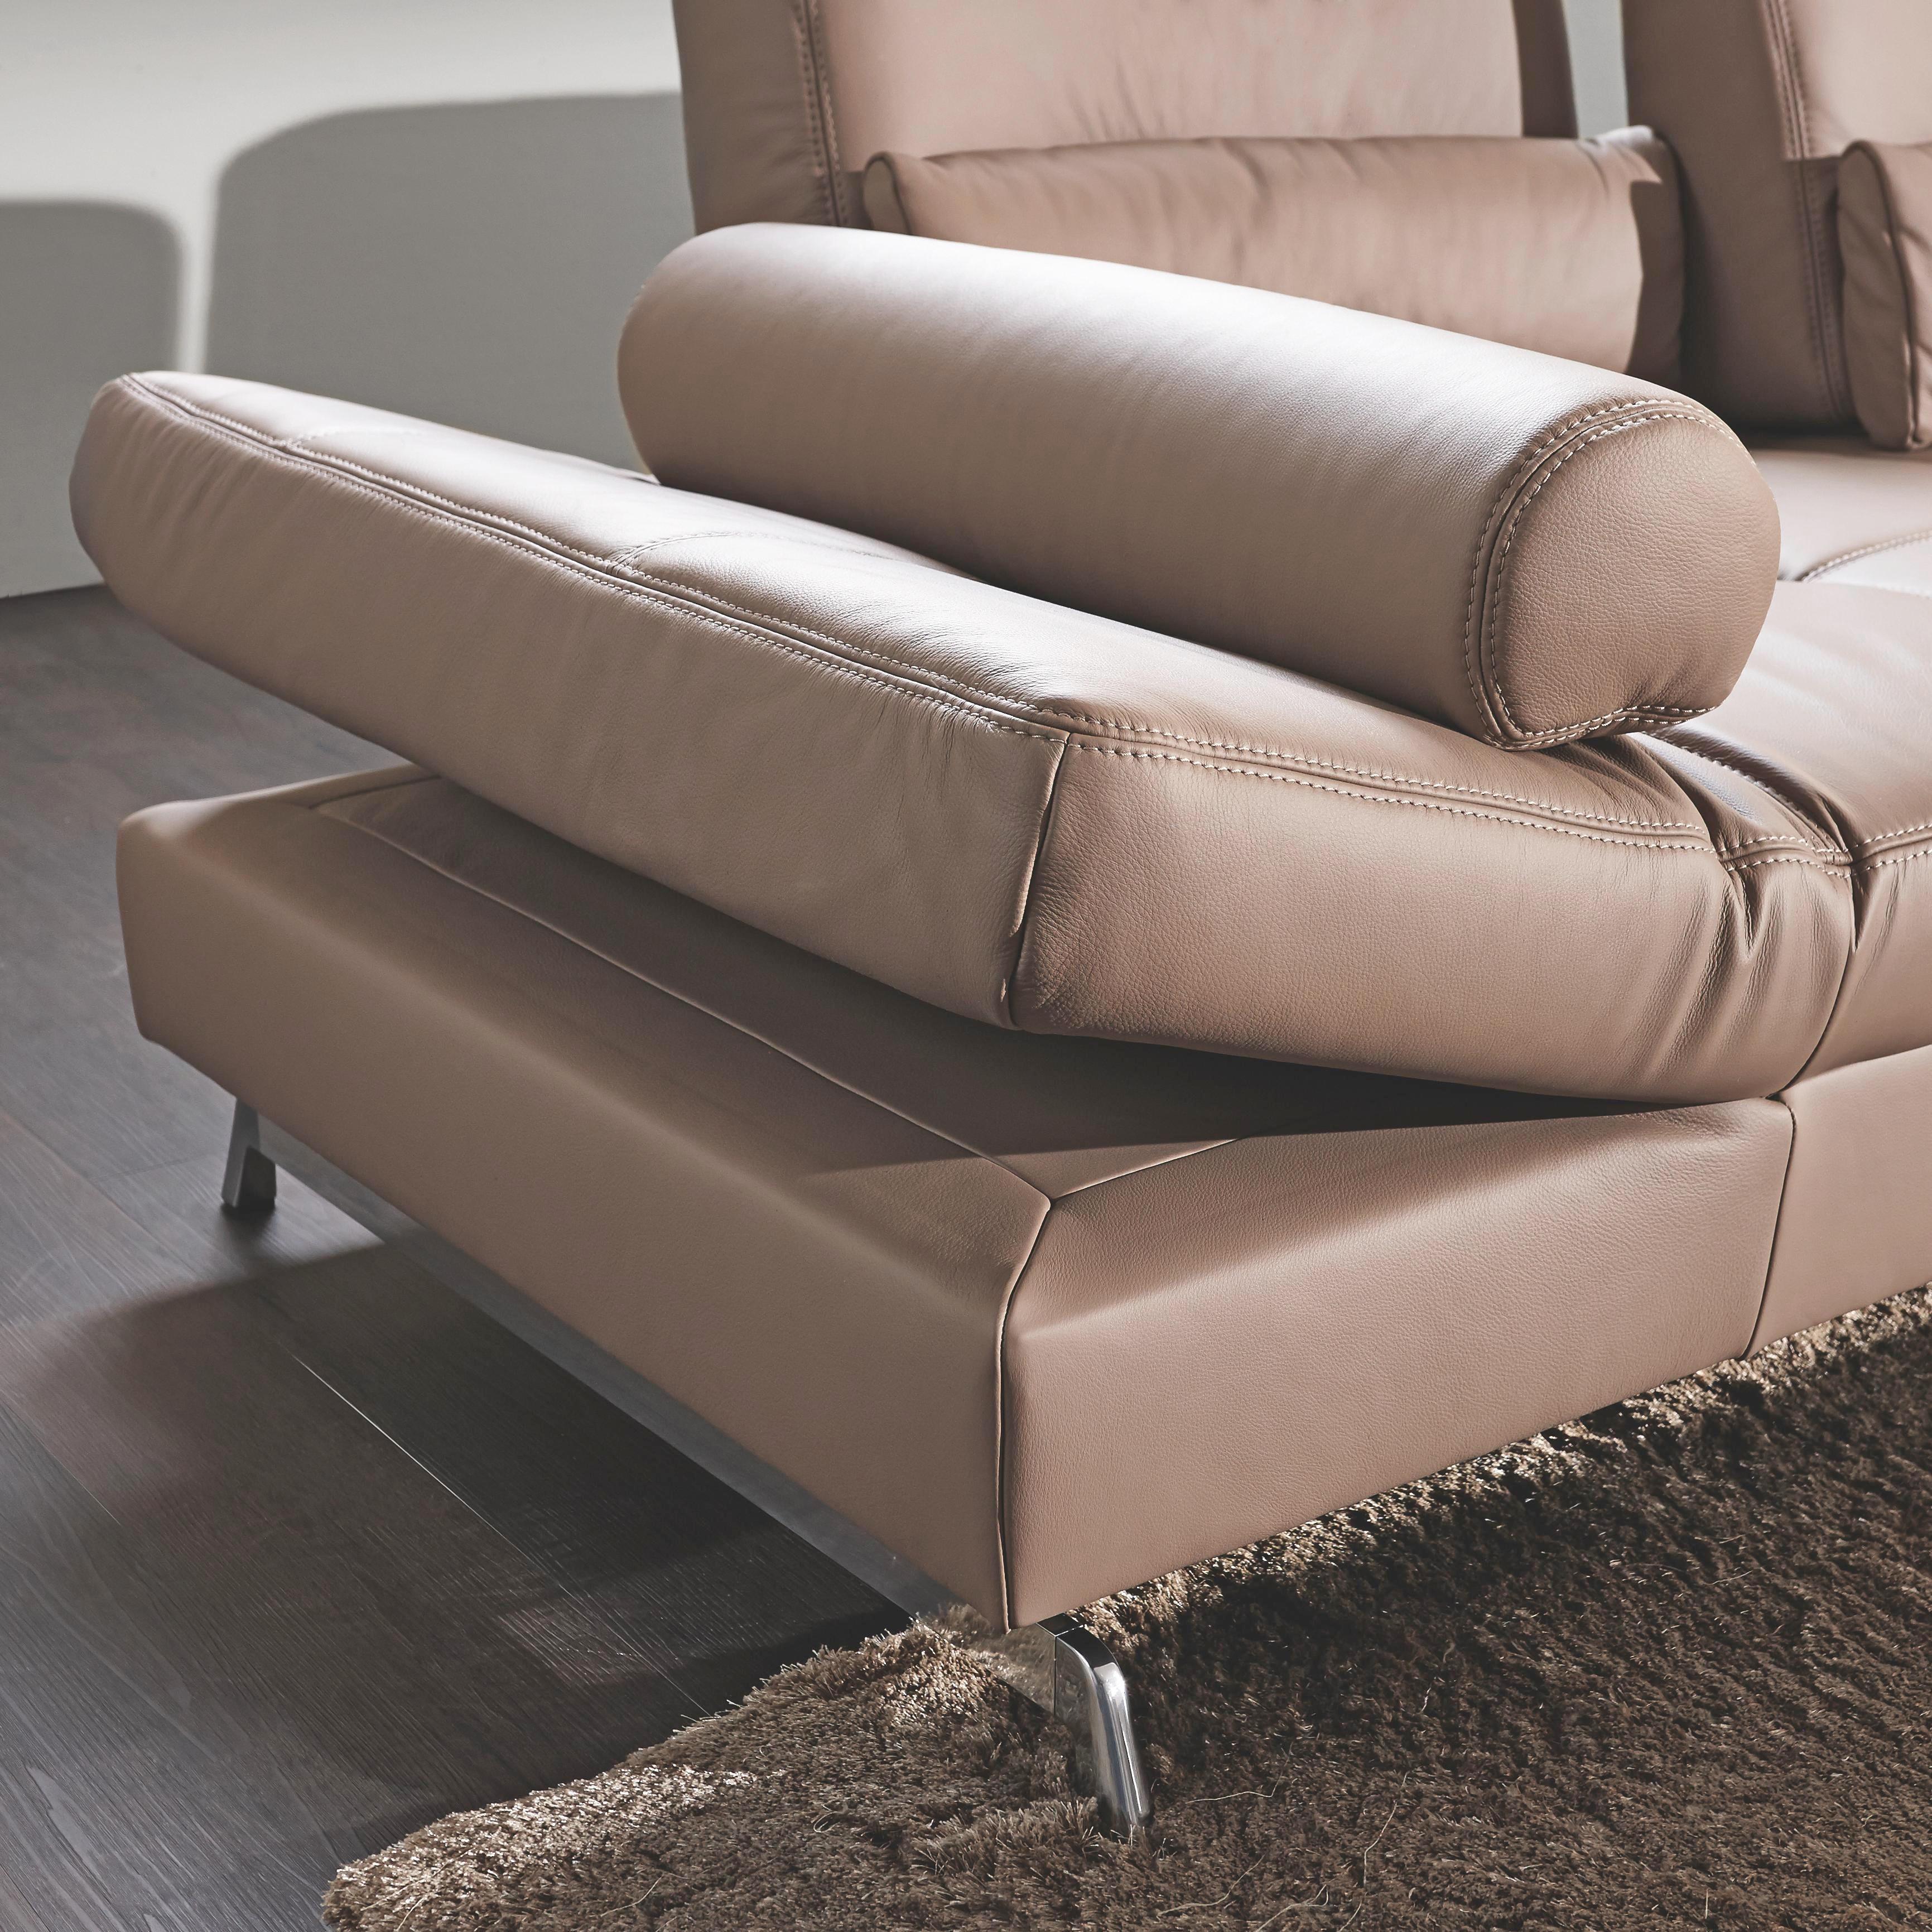 WOHNLANDSCHAFT in Braun Leder - Alufarben/Braun, Design, Leder/Metall (299/250cm) - JOOP